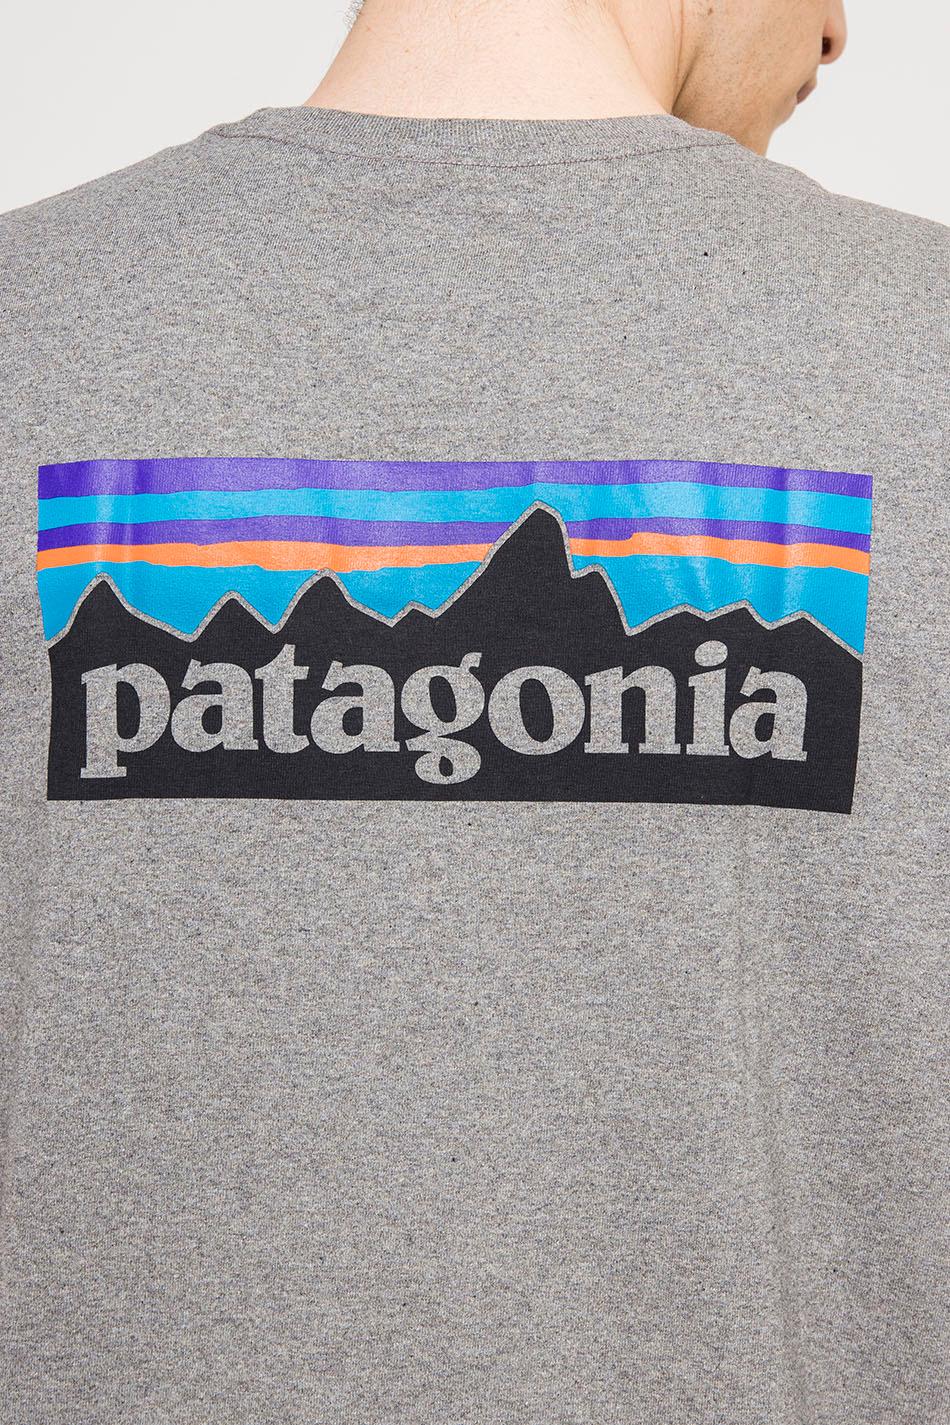 Patagonia Responsibili-Tee Grey